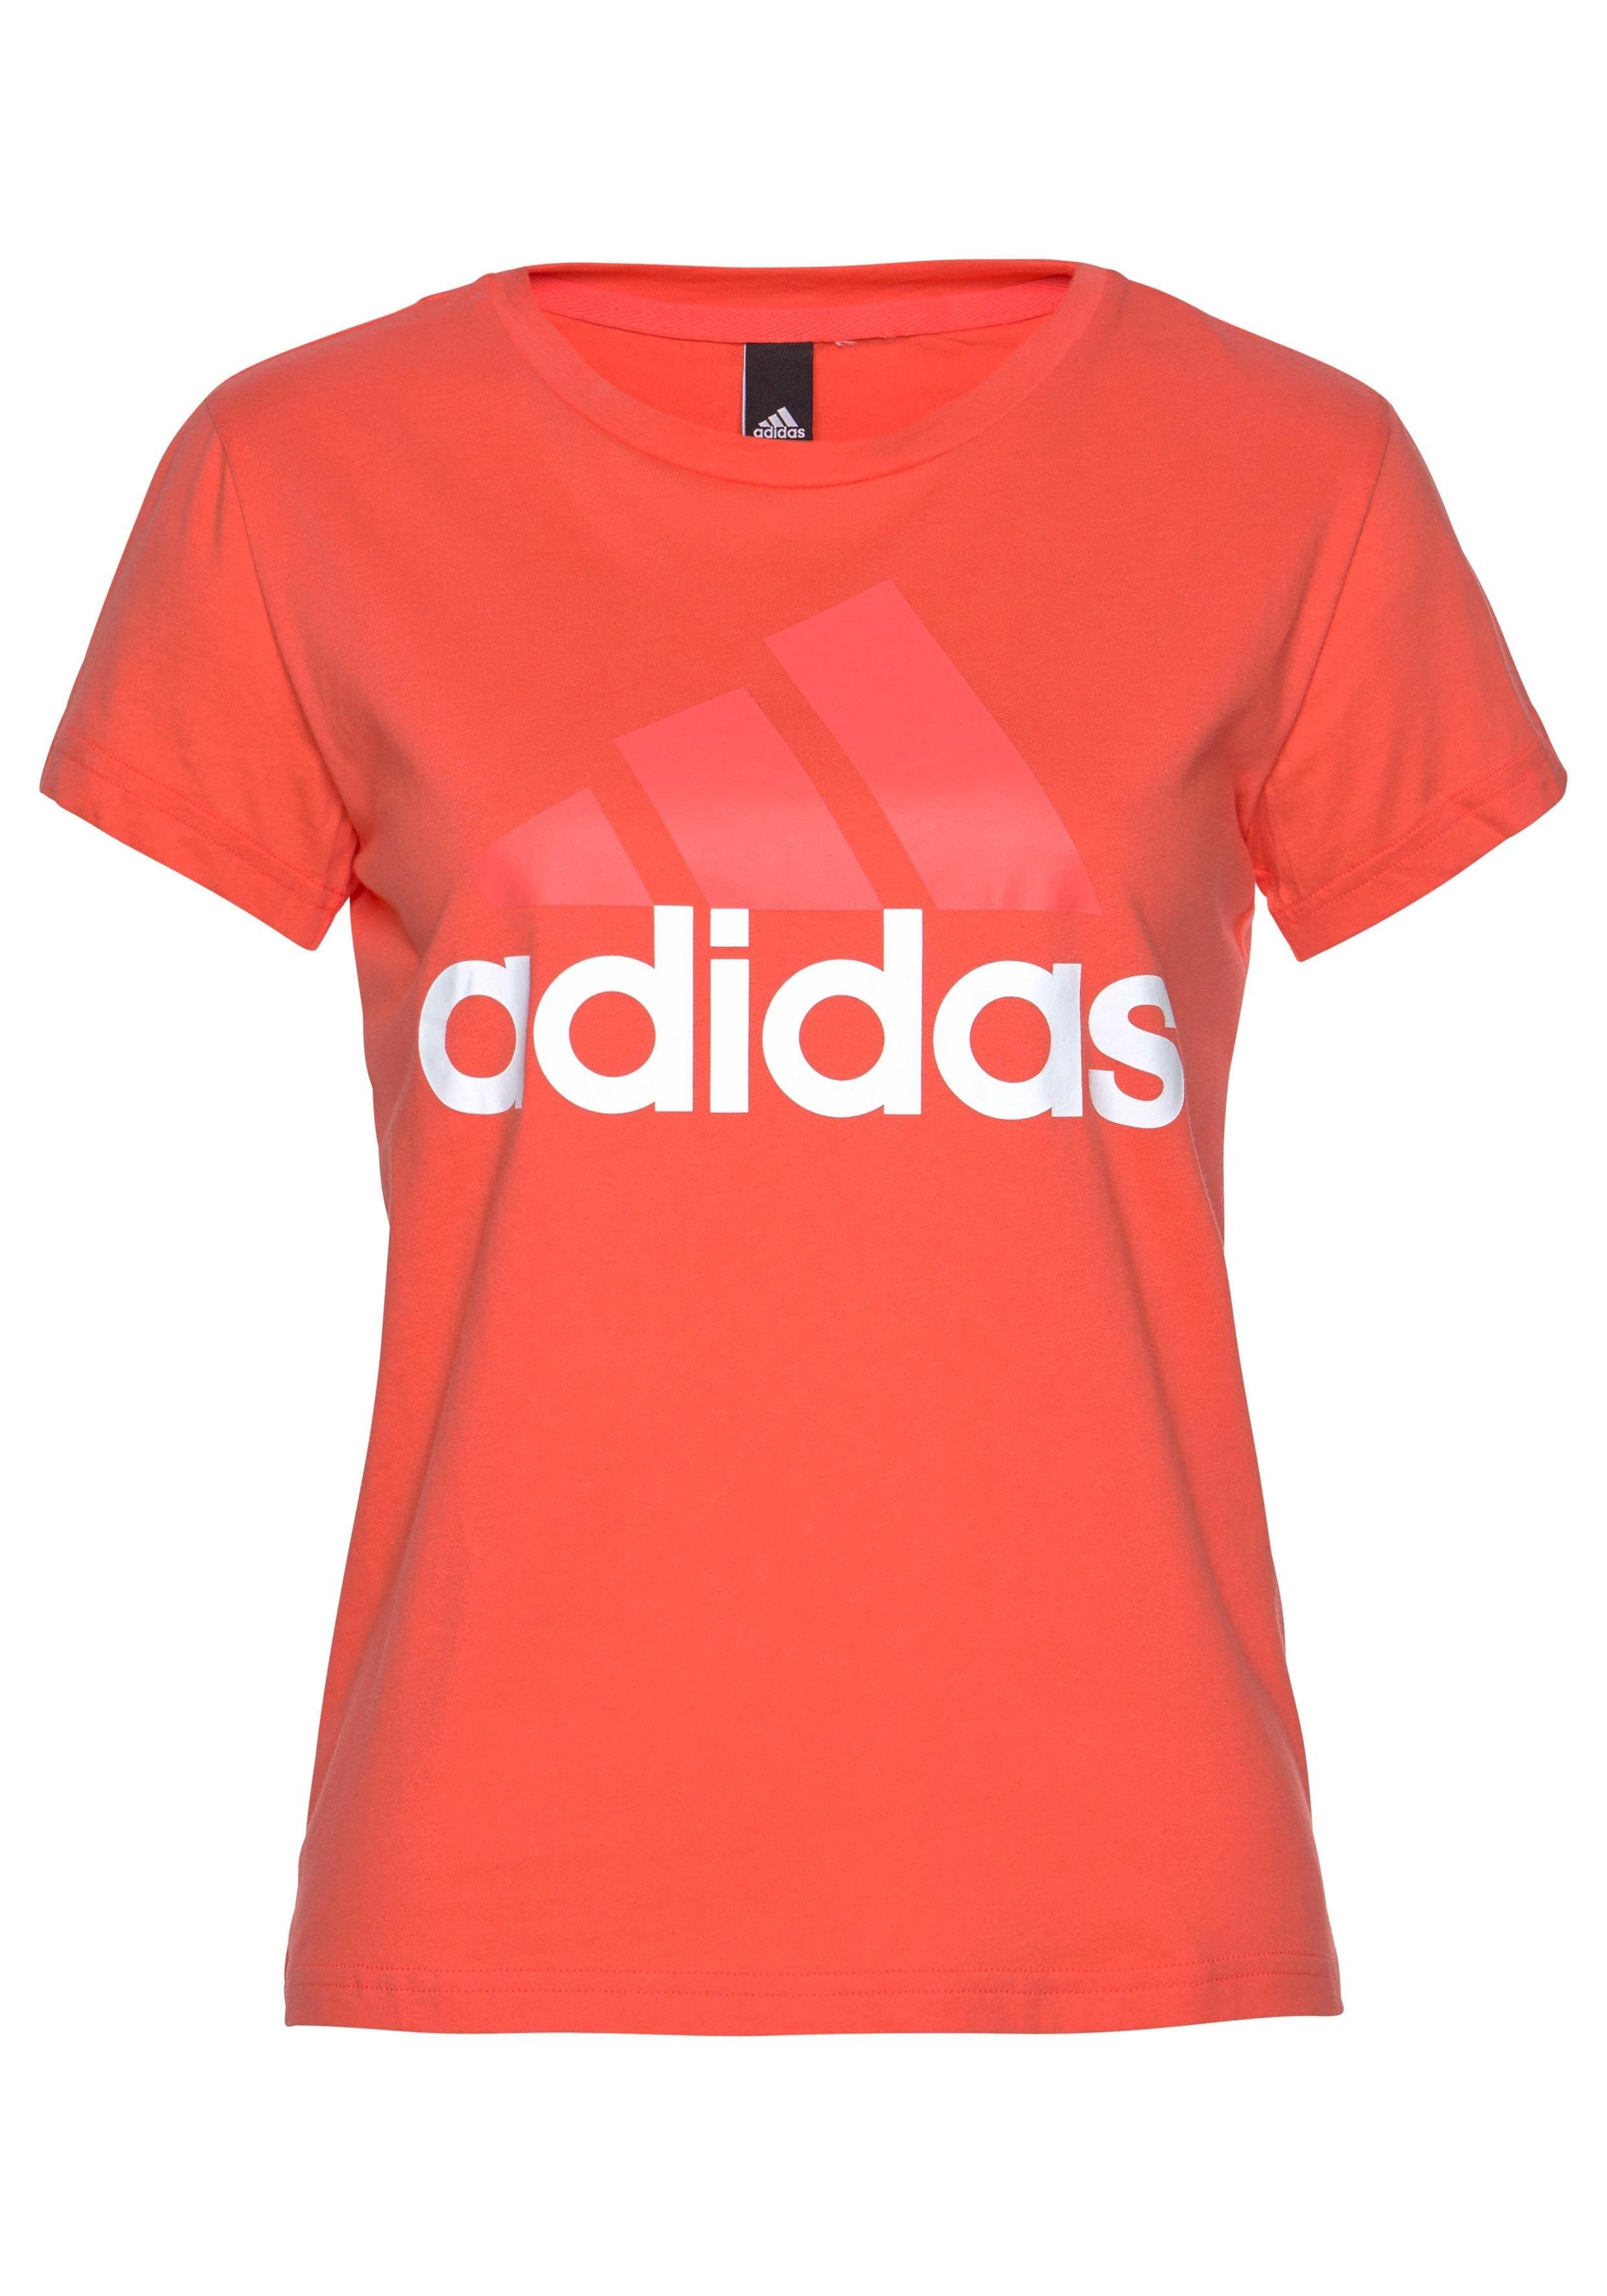 Performance Slim shirtessentials Kopen T Online Adidas Tee Line wPX80ONnk